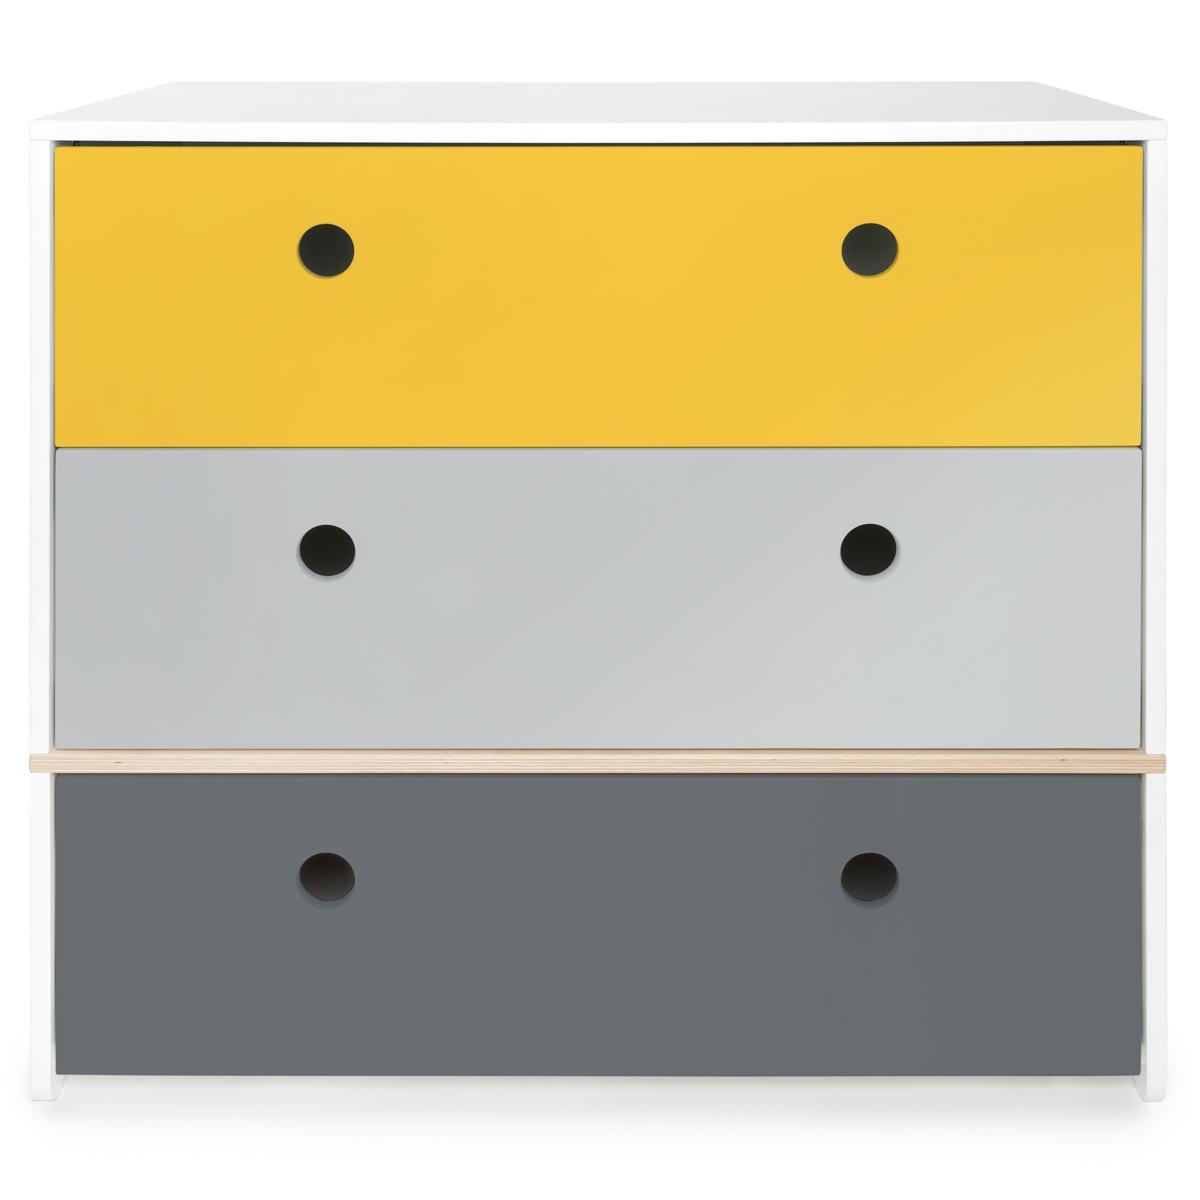 Kommode COLORFLEX Abitare Kids Schubladen Farben nectar yellow-pearl grey-space grey